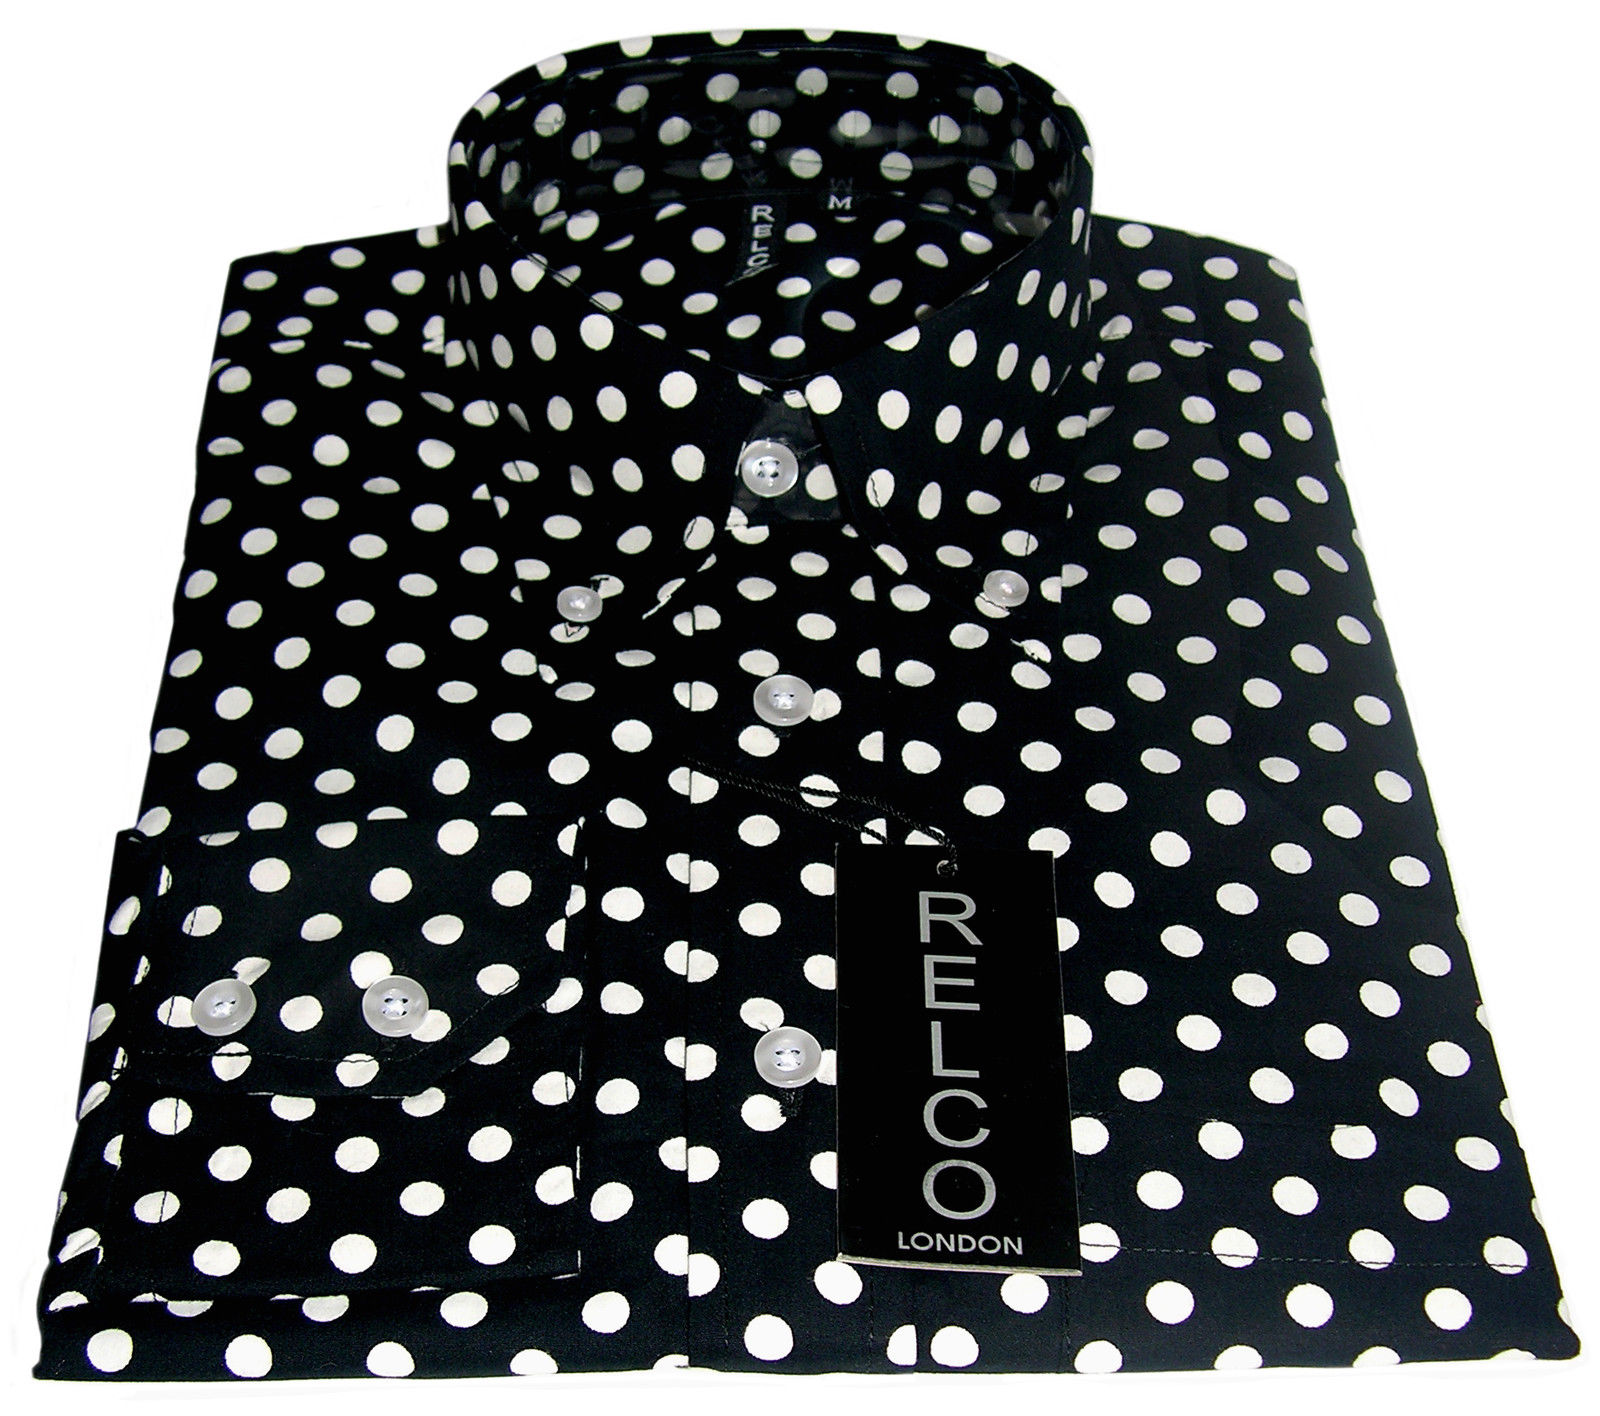 Making my 12th doctor costume: Polka-dot shirt